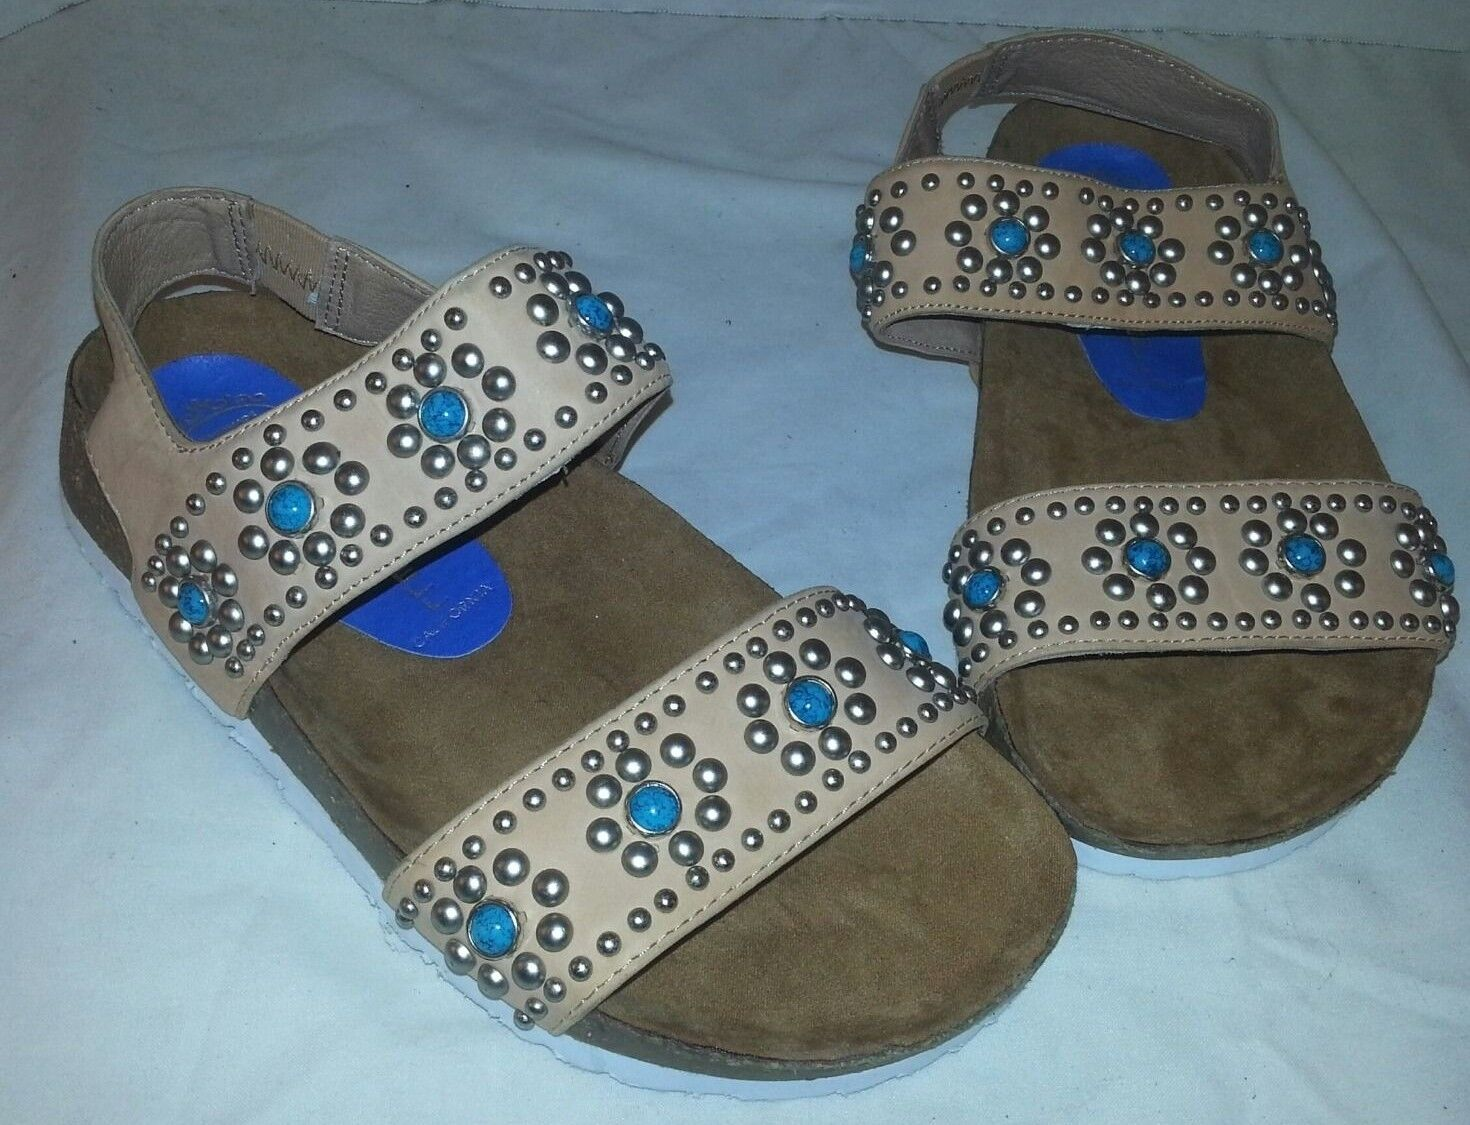 Nuevo Jeffery Campbell Campbell Campbell Beige Cordoba embellecido Sandalias Zapatos Para Mujer Talla 6  tomar hasta un 70% de descuento